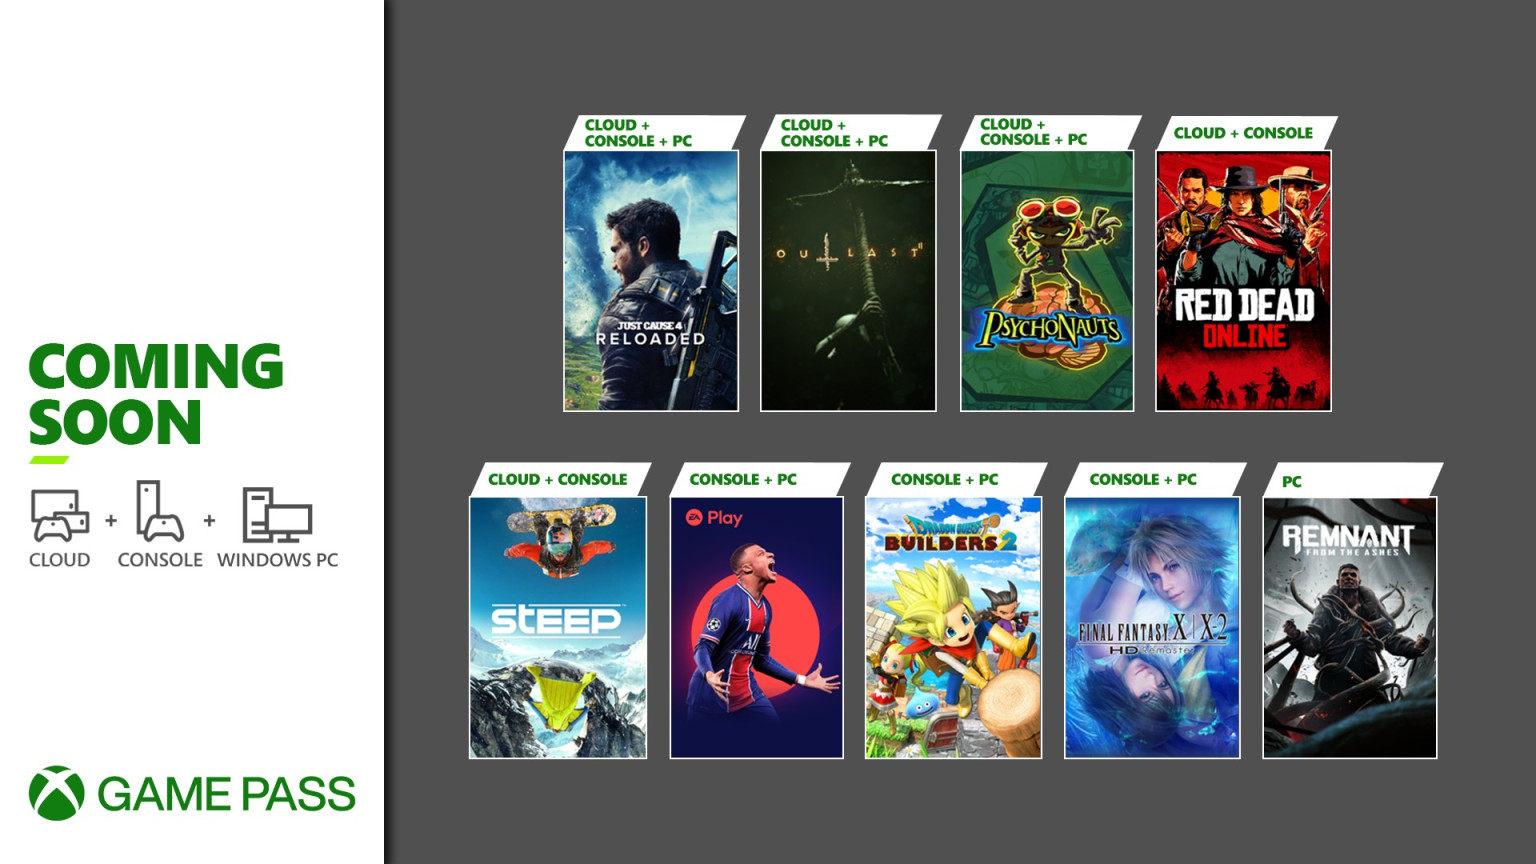 XGP五月游戏更新,《勇者斗恶龙:创世小玩家2》、《FIFA 21》共9款游戏登陆